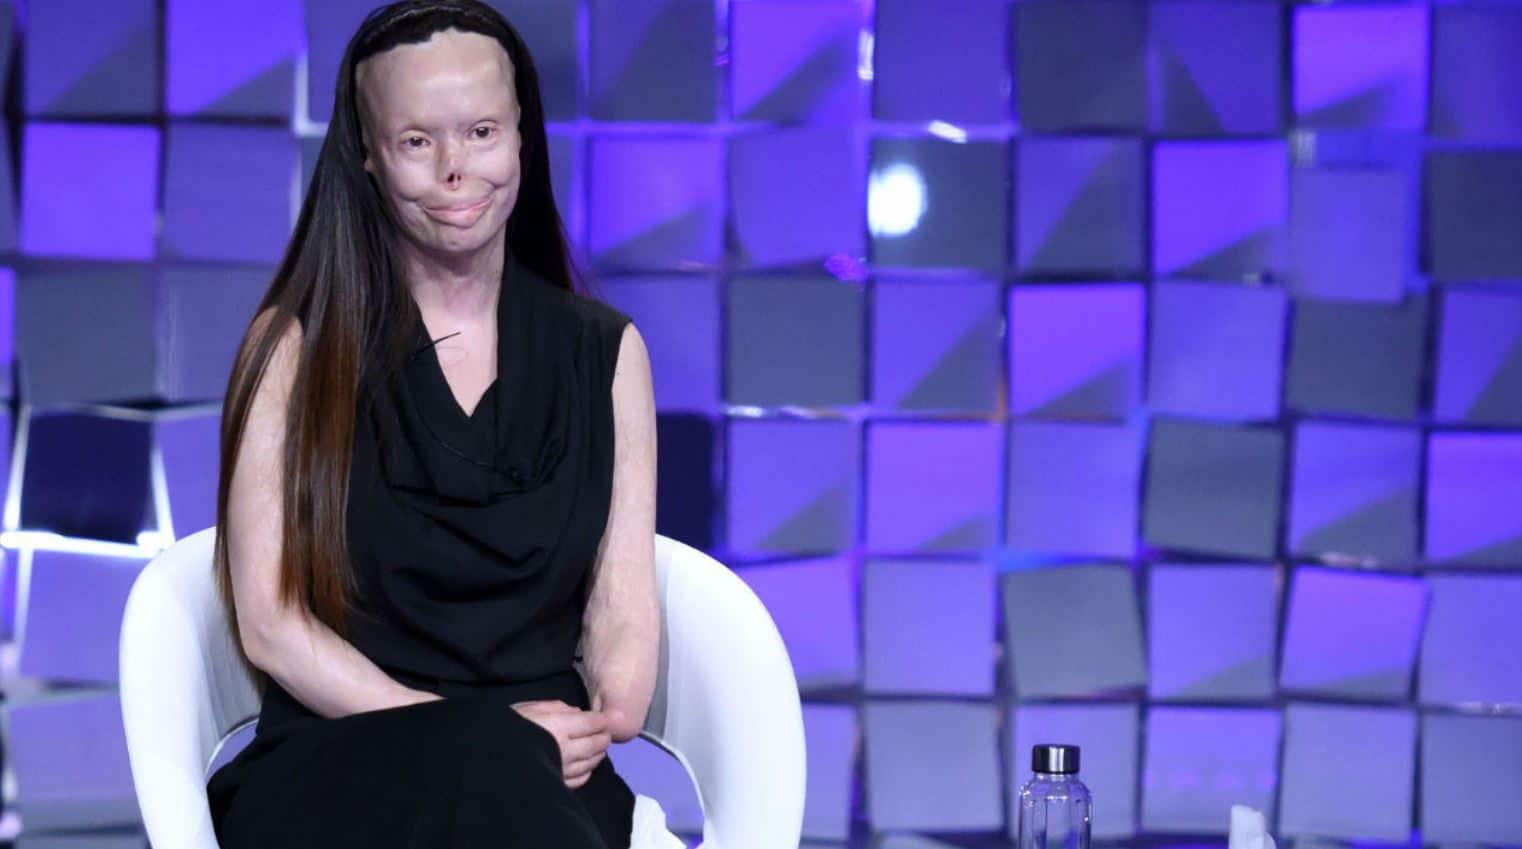 Valentina Pitzalis a Verissimo: il calvario lungo 9 anni